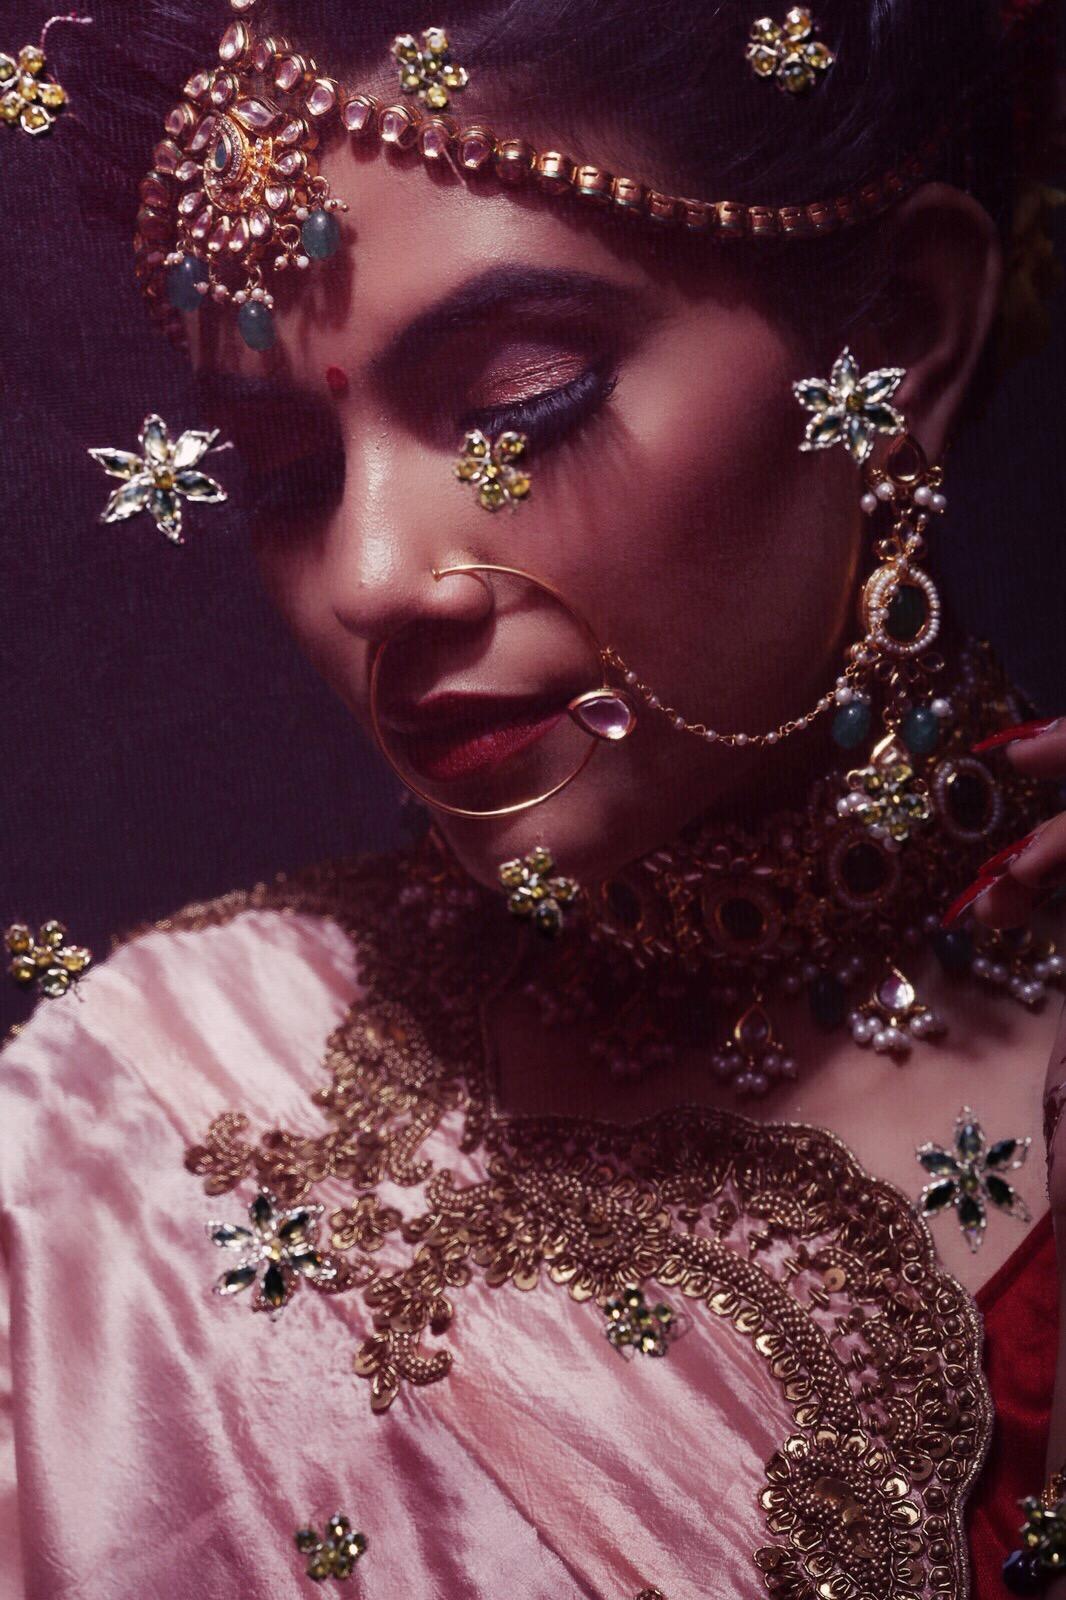 makeup-artist-prachi-bhagra-makeup-artist-delhi-ncr